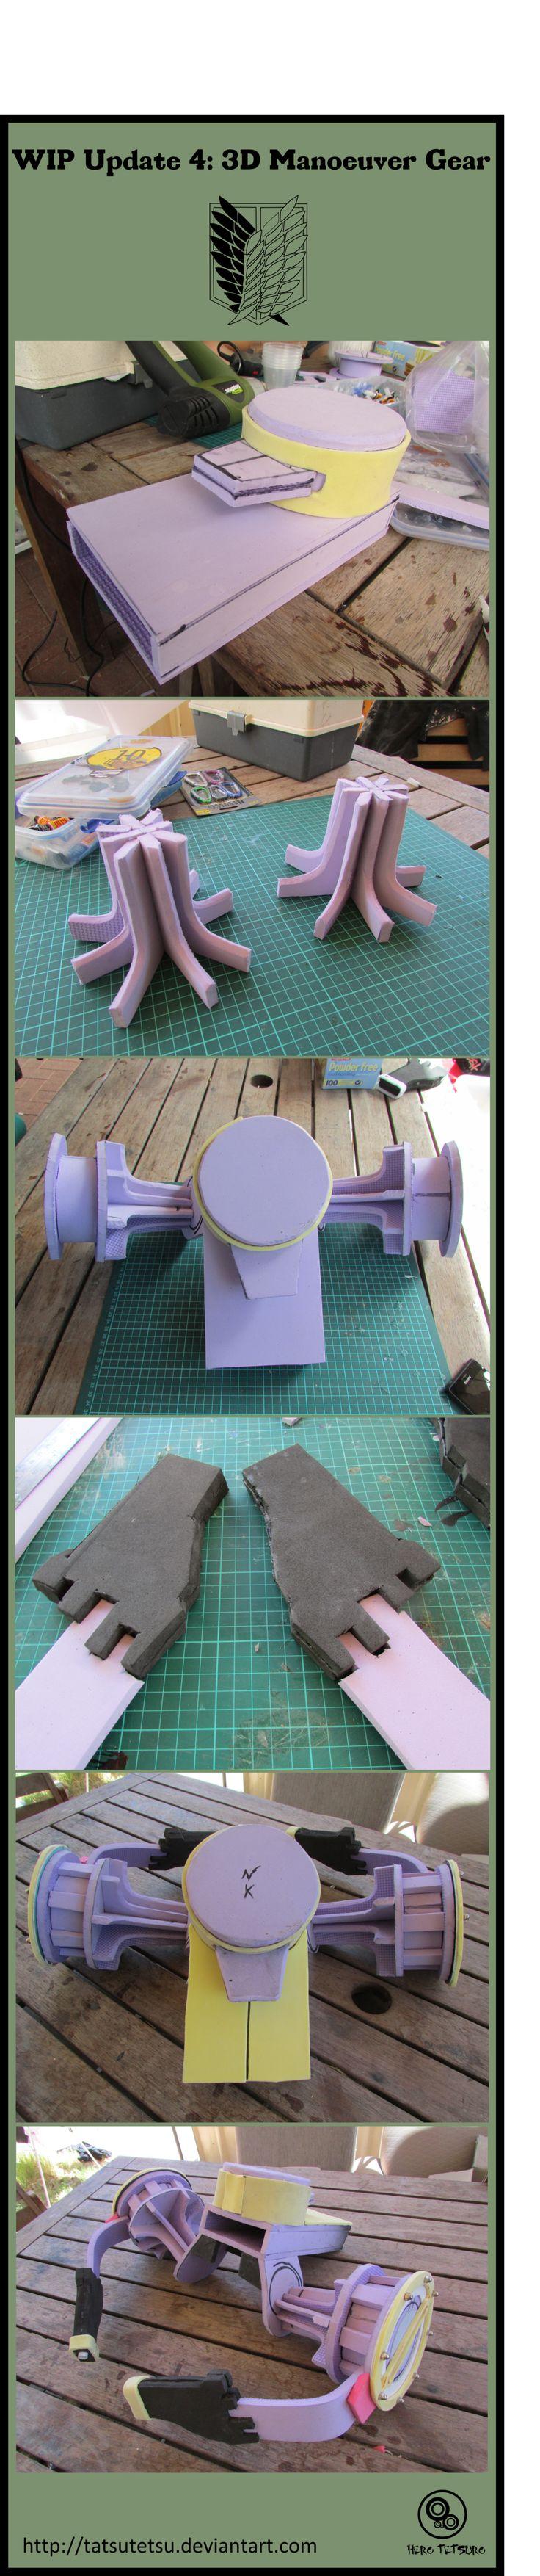 Shingeki no kyojin :3D Manoeuvre Gear WIP Update 4 by Tatsutetsu on DeviantArt